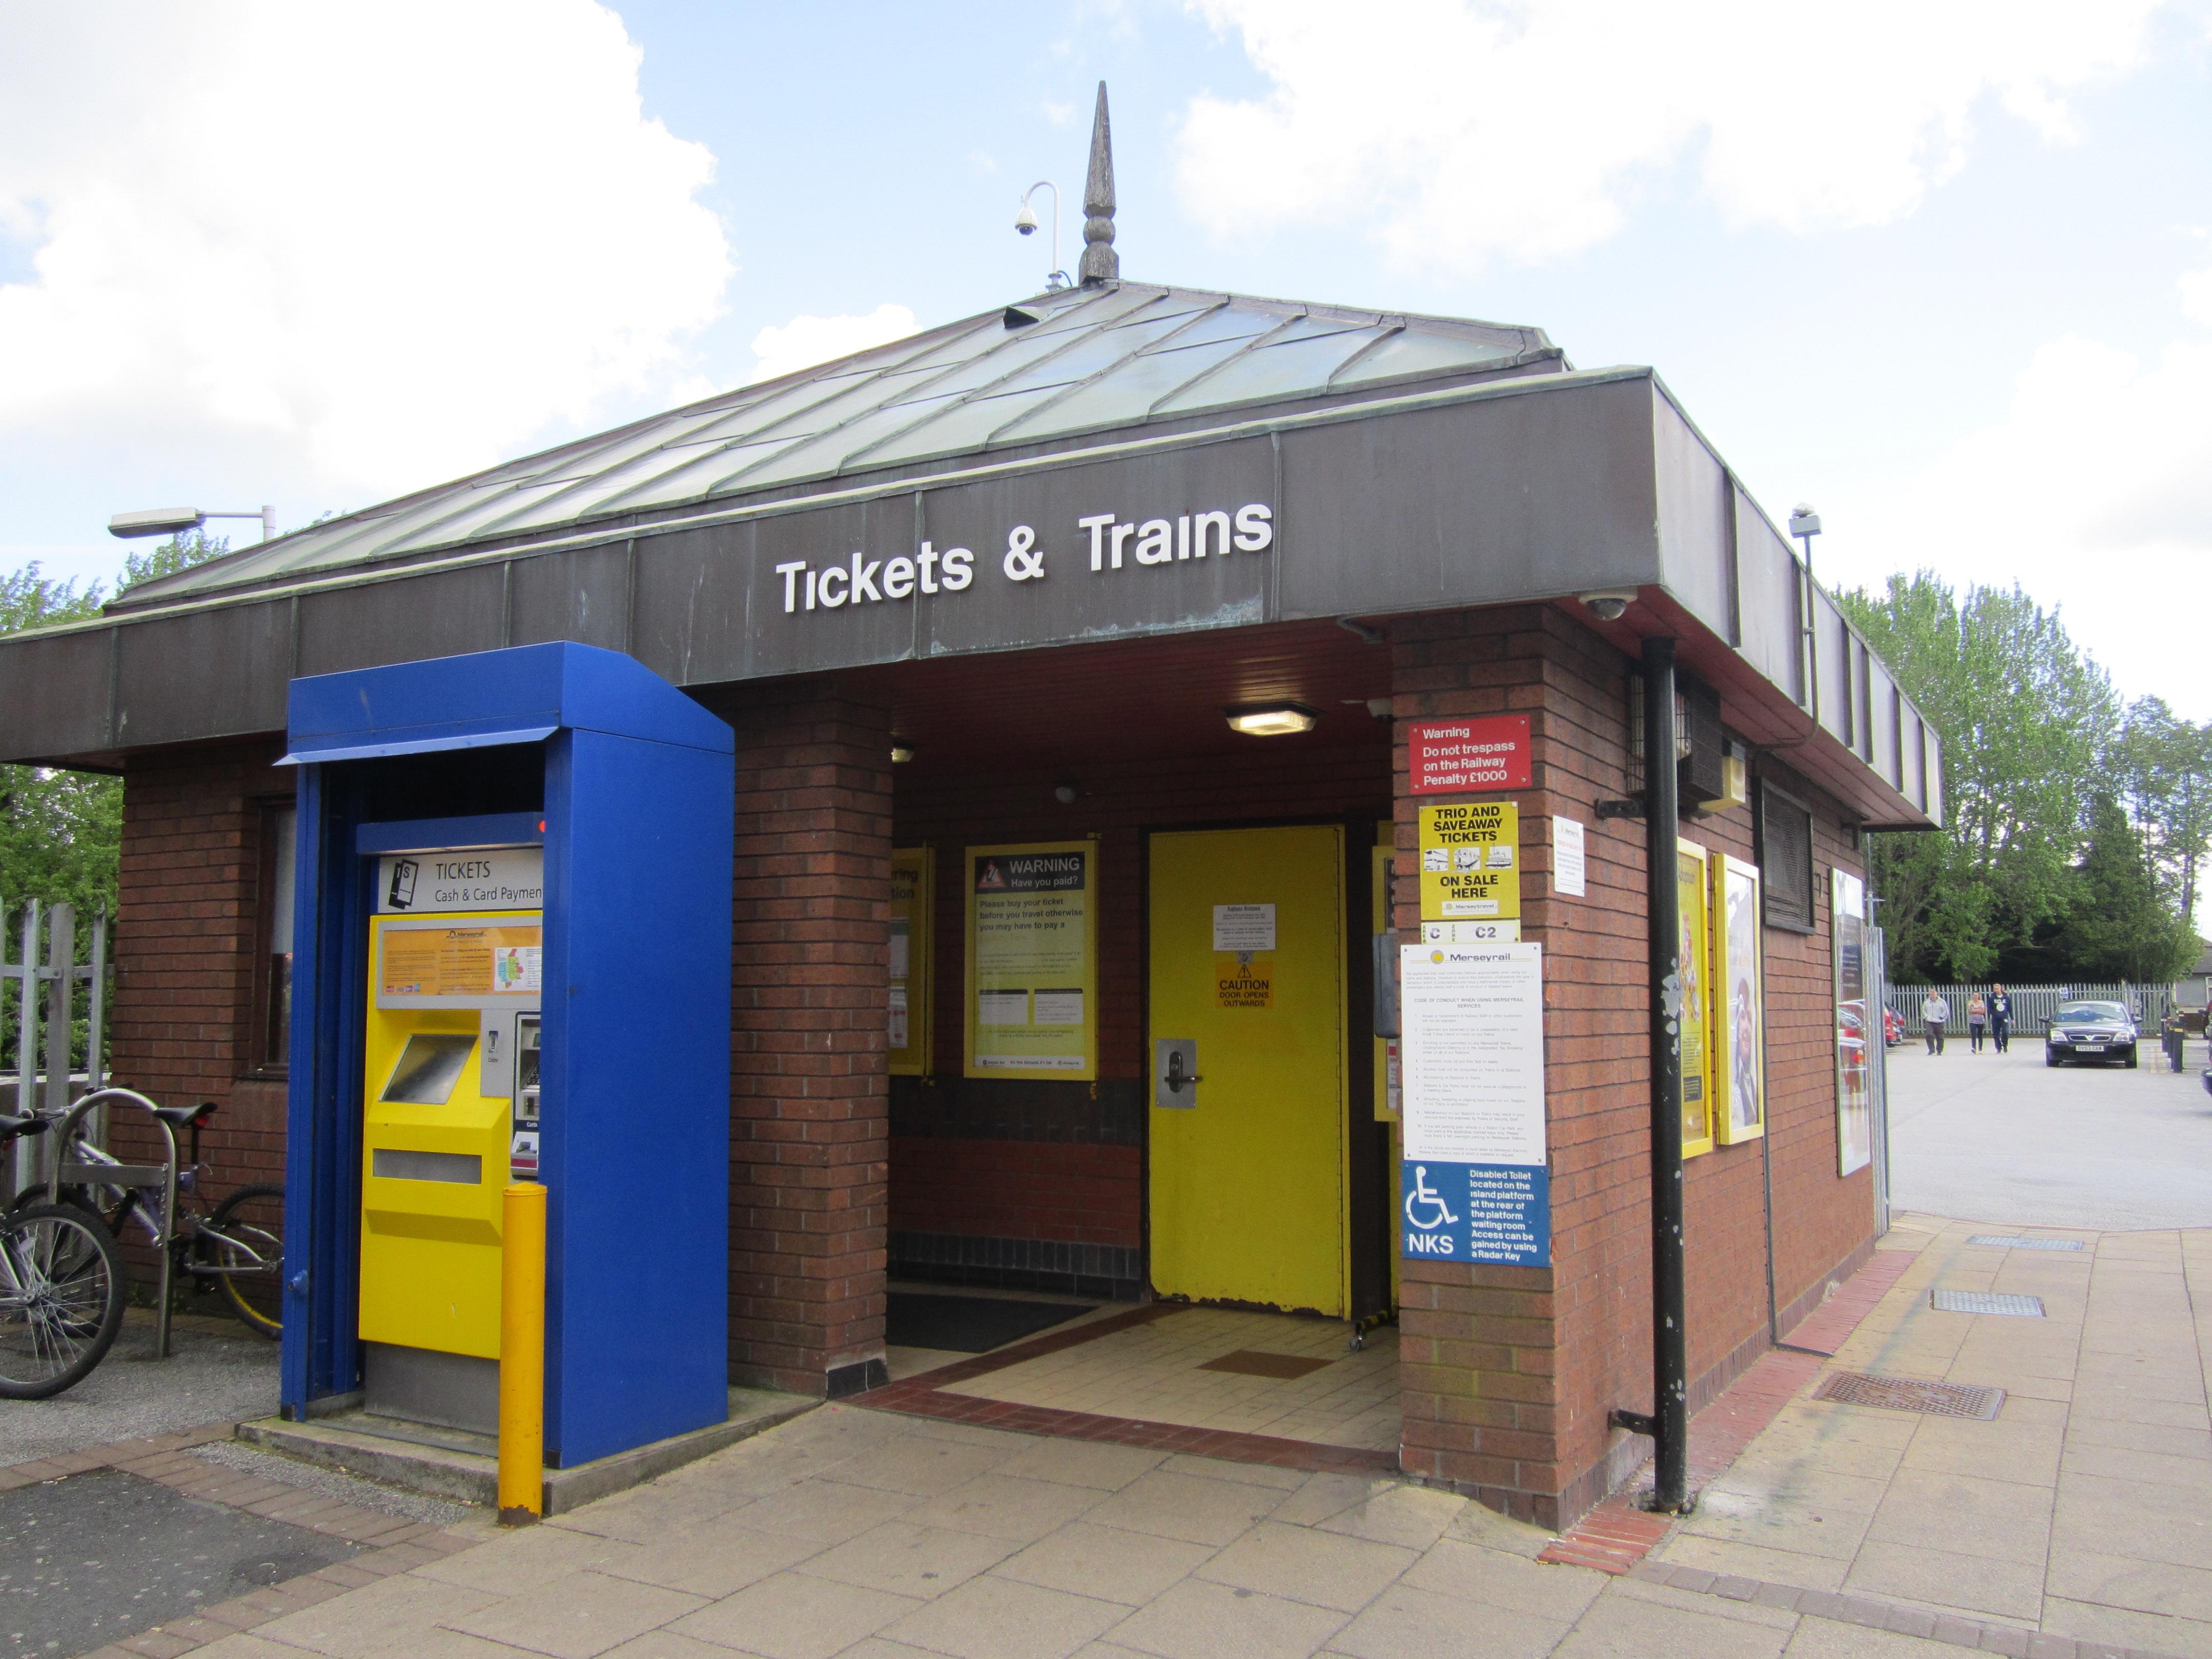 File:Hunt's Cross railway station (4) JPG - Wikimedia Commons